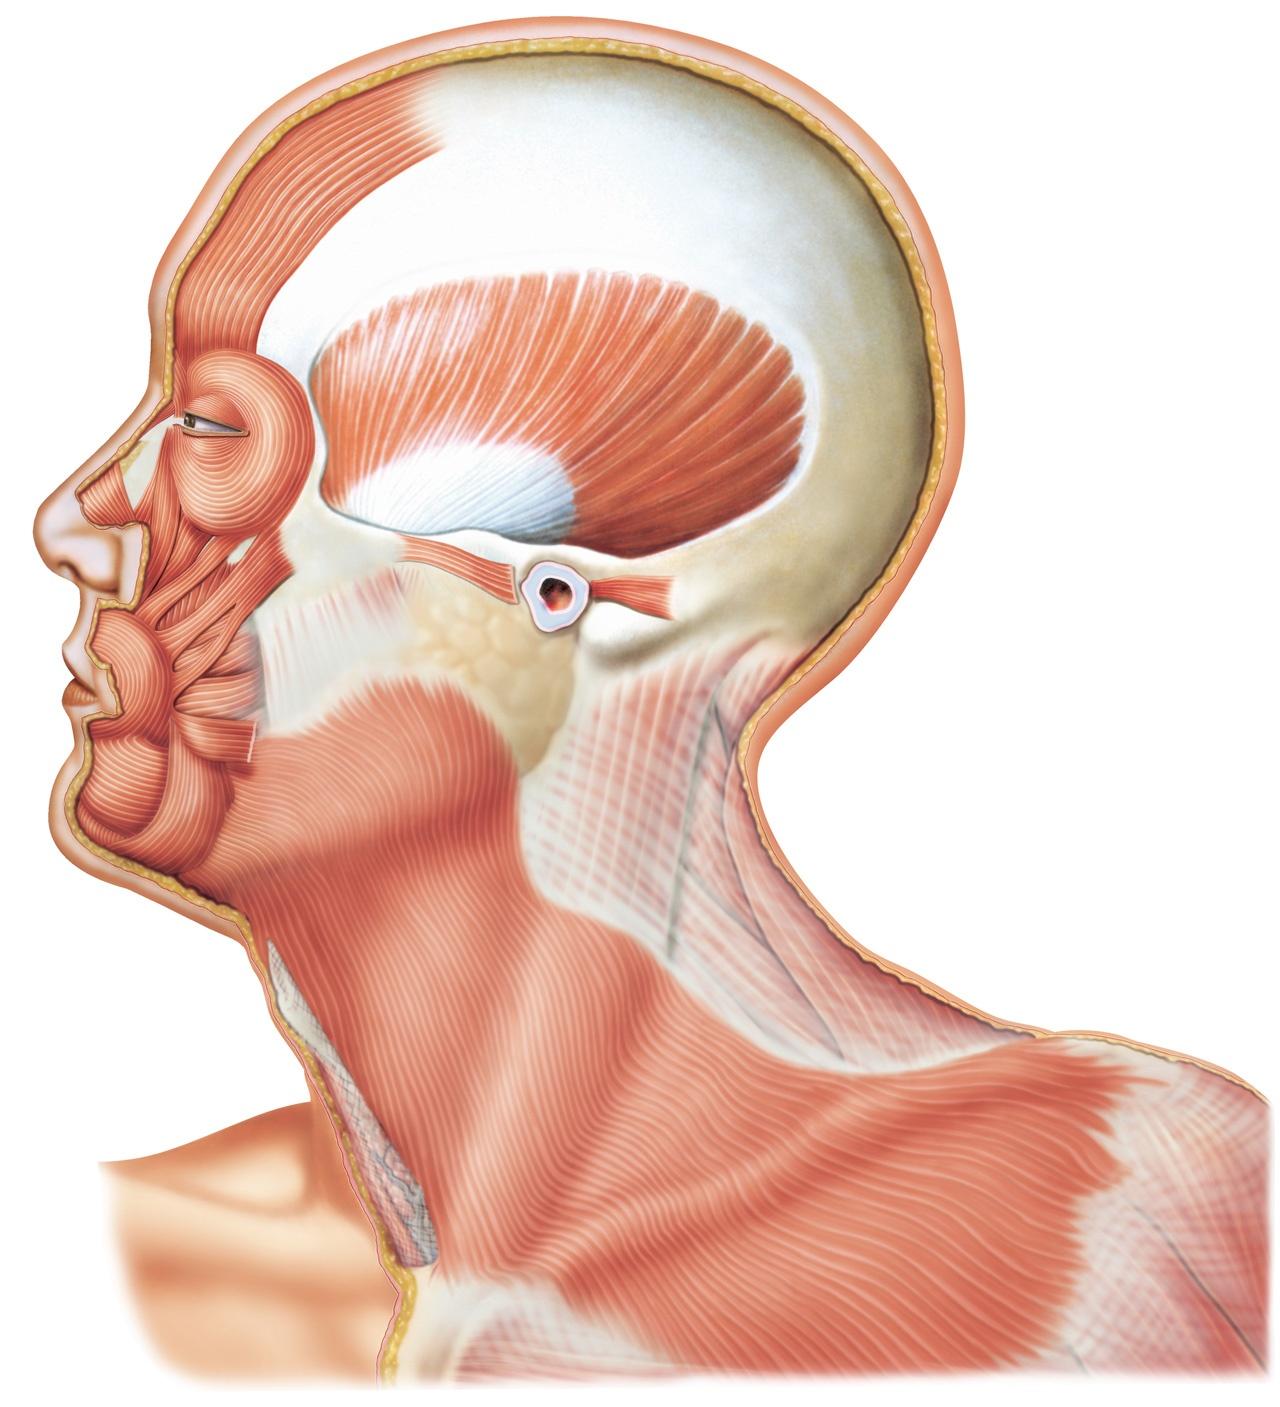 cancer-glandulas-salivales-interno.jpg